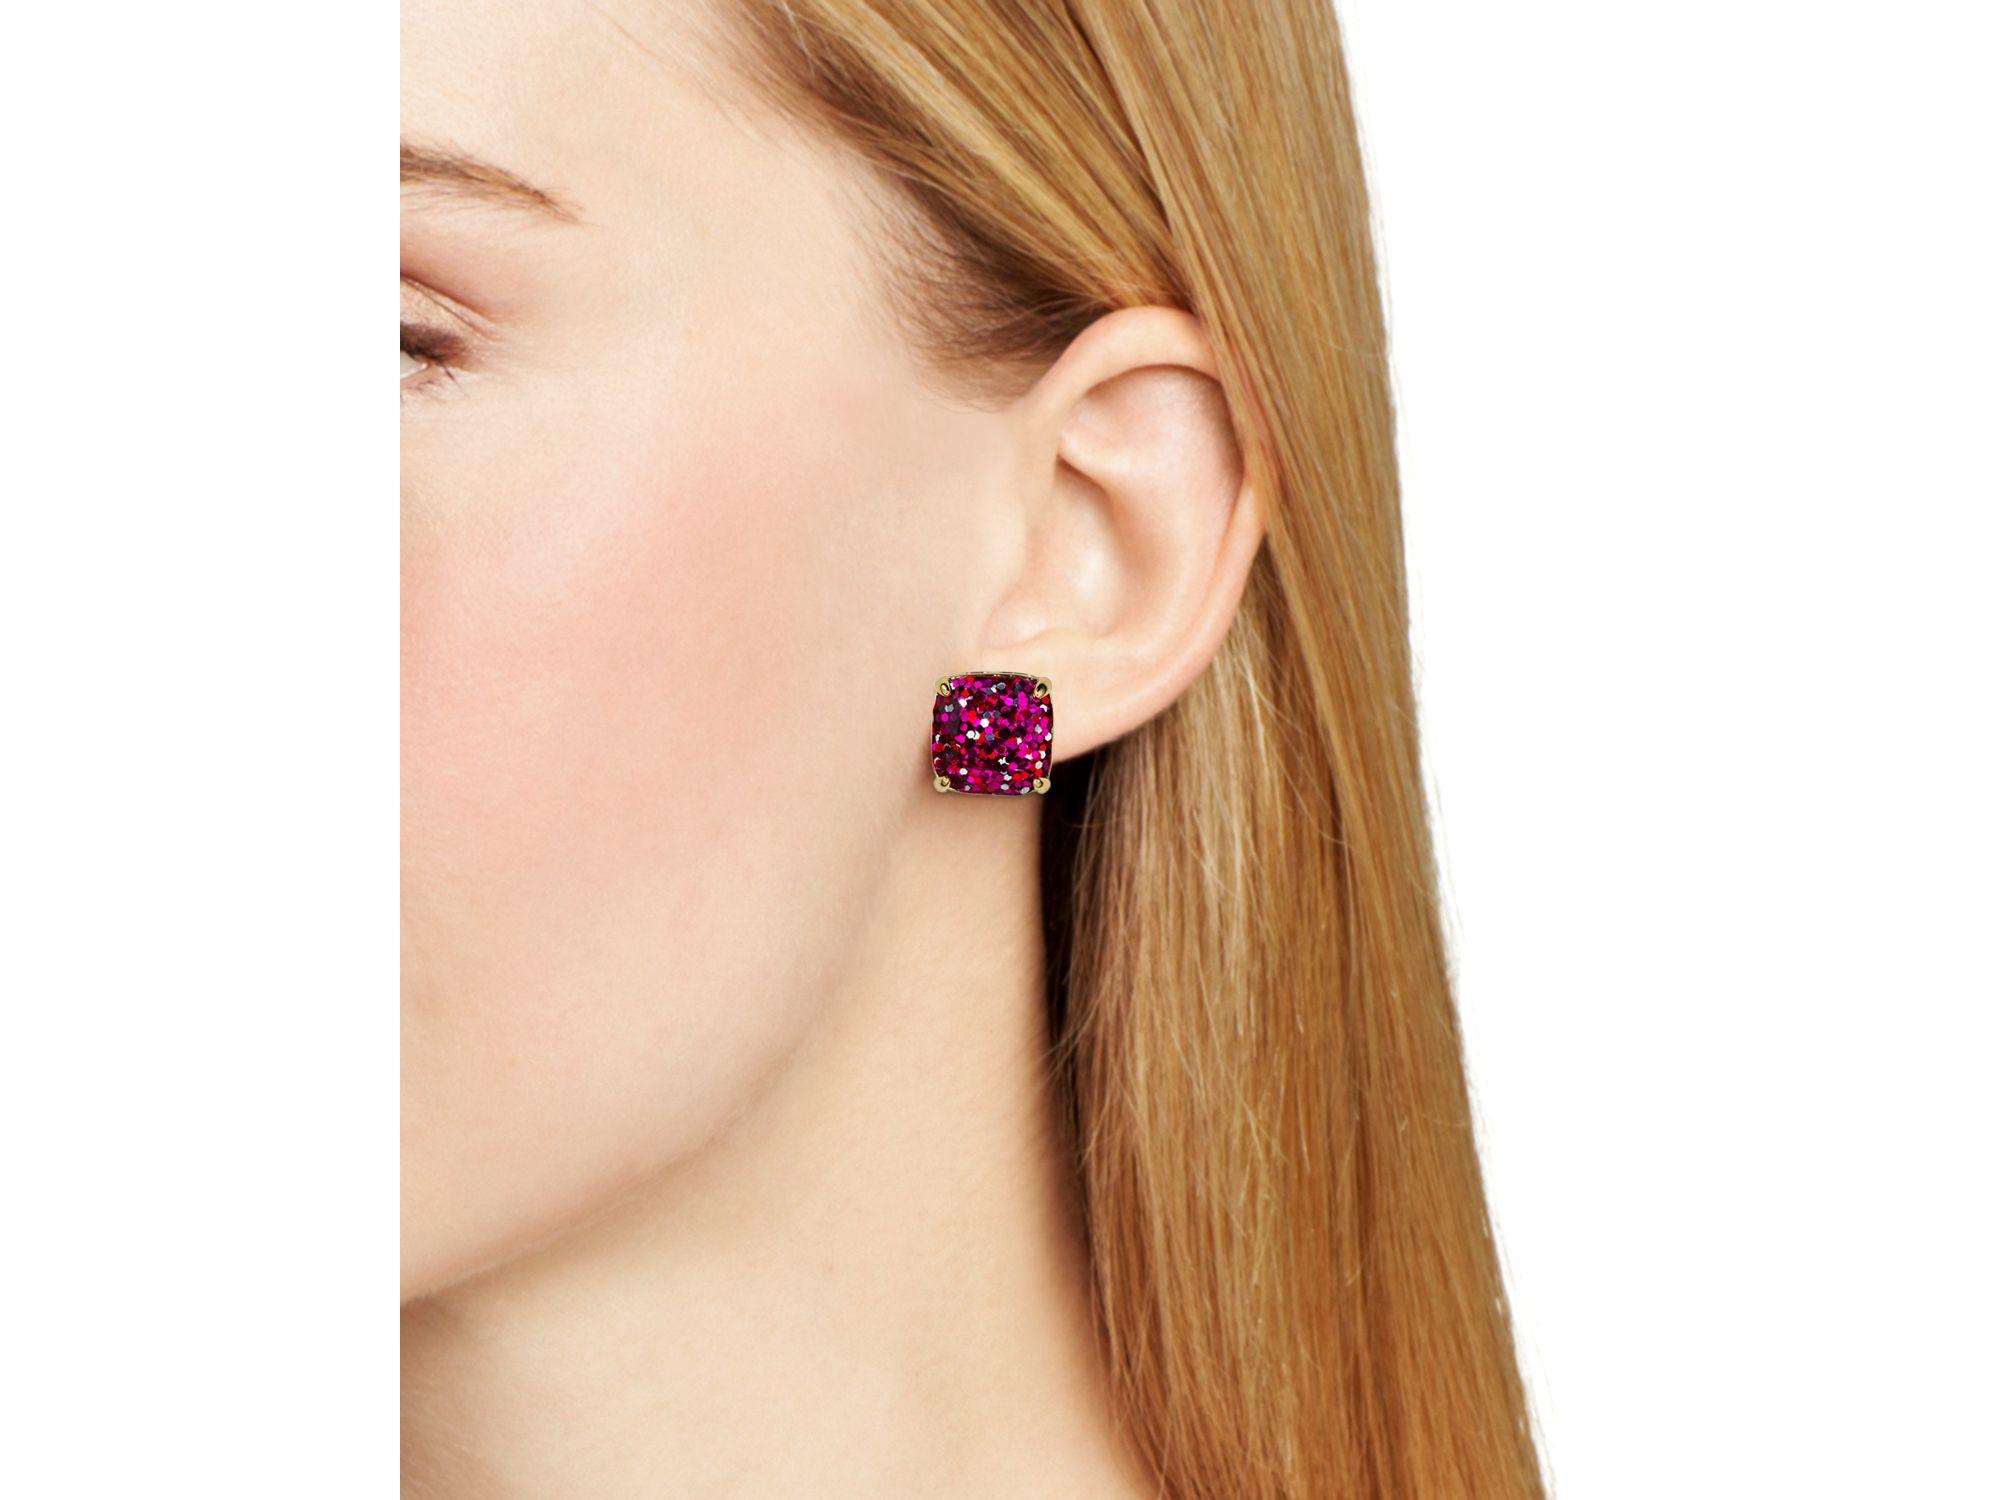 Kate Spade New York Small Square Glitter Stud Earrings In Metallic